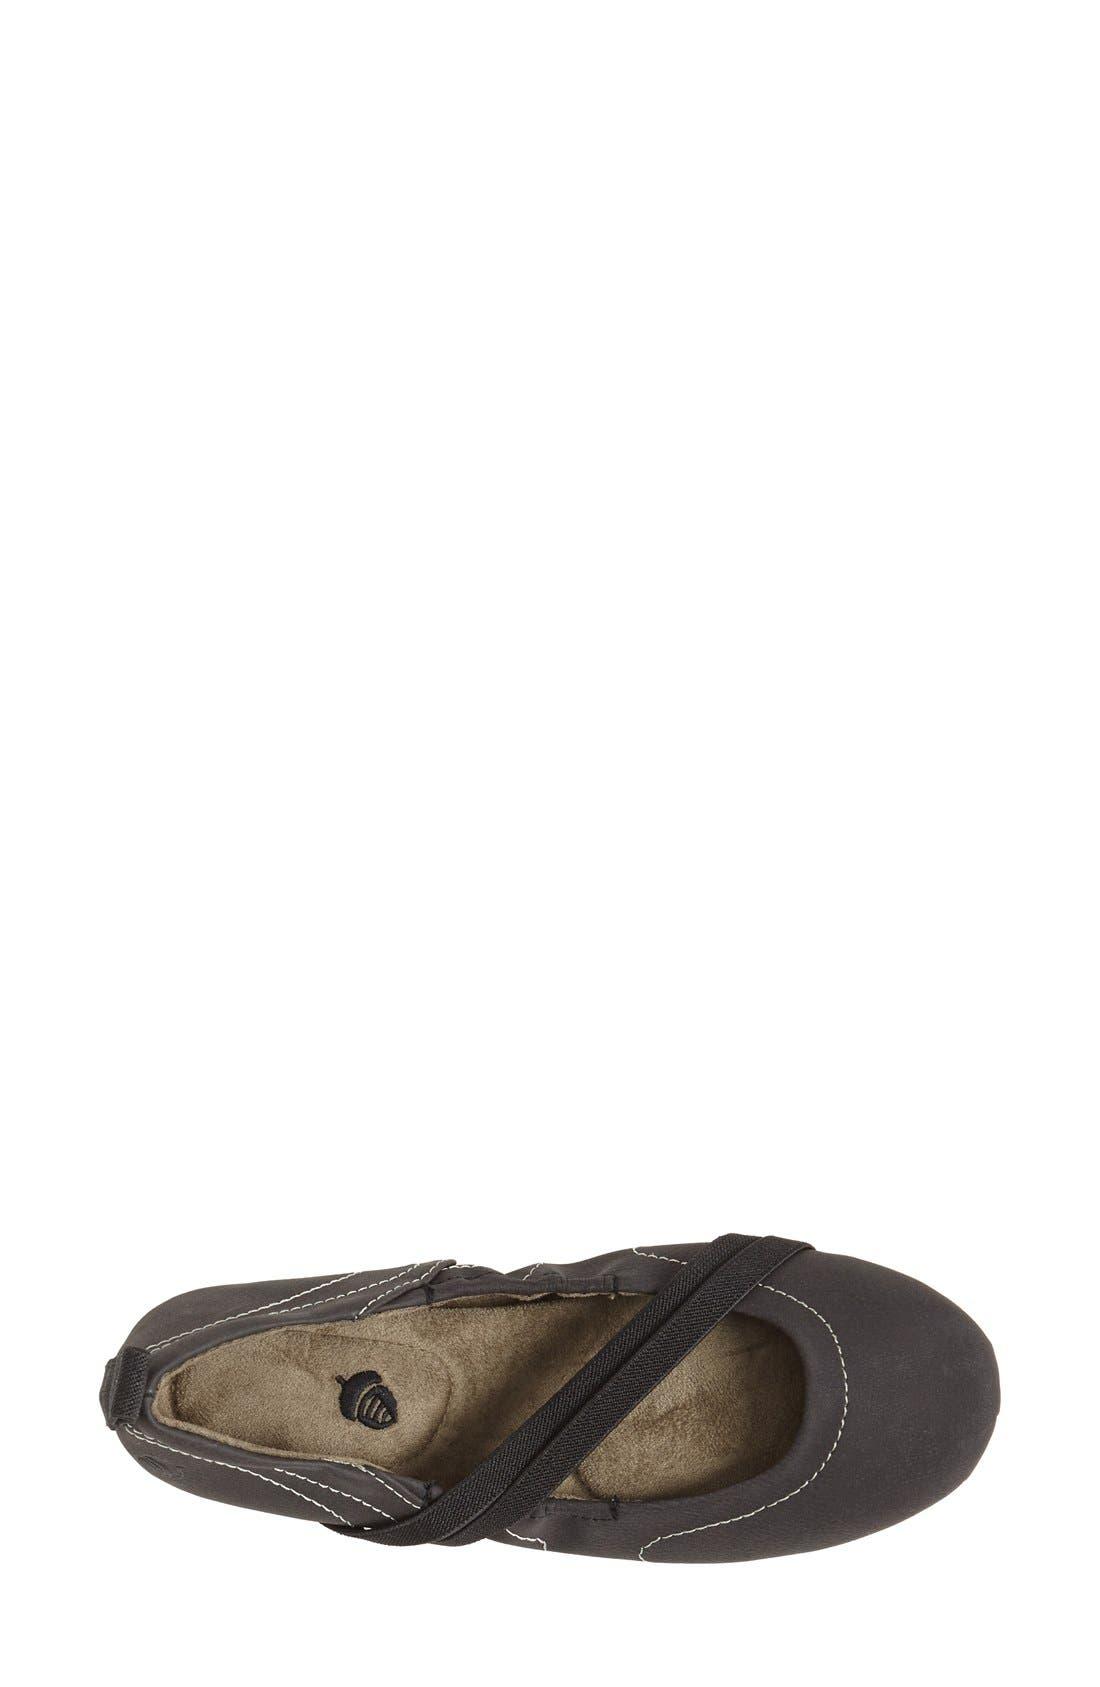 Alternate Image 3  - Acorn 'Via Wrap' Flat (Online Only)